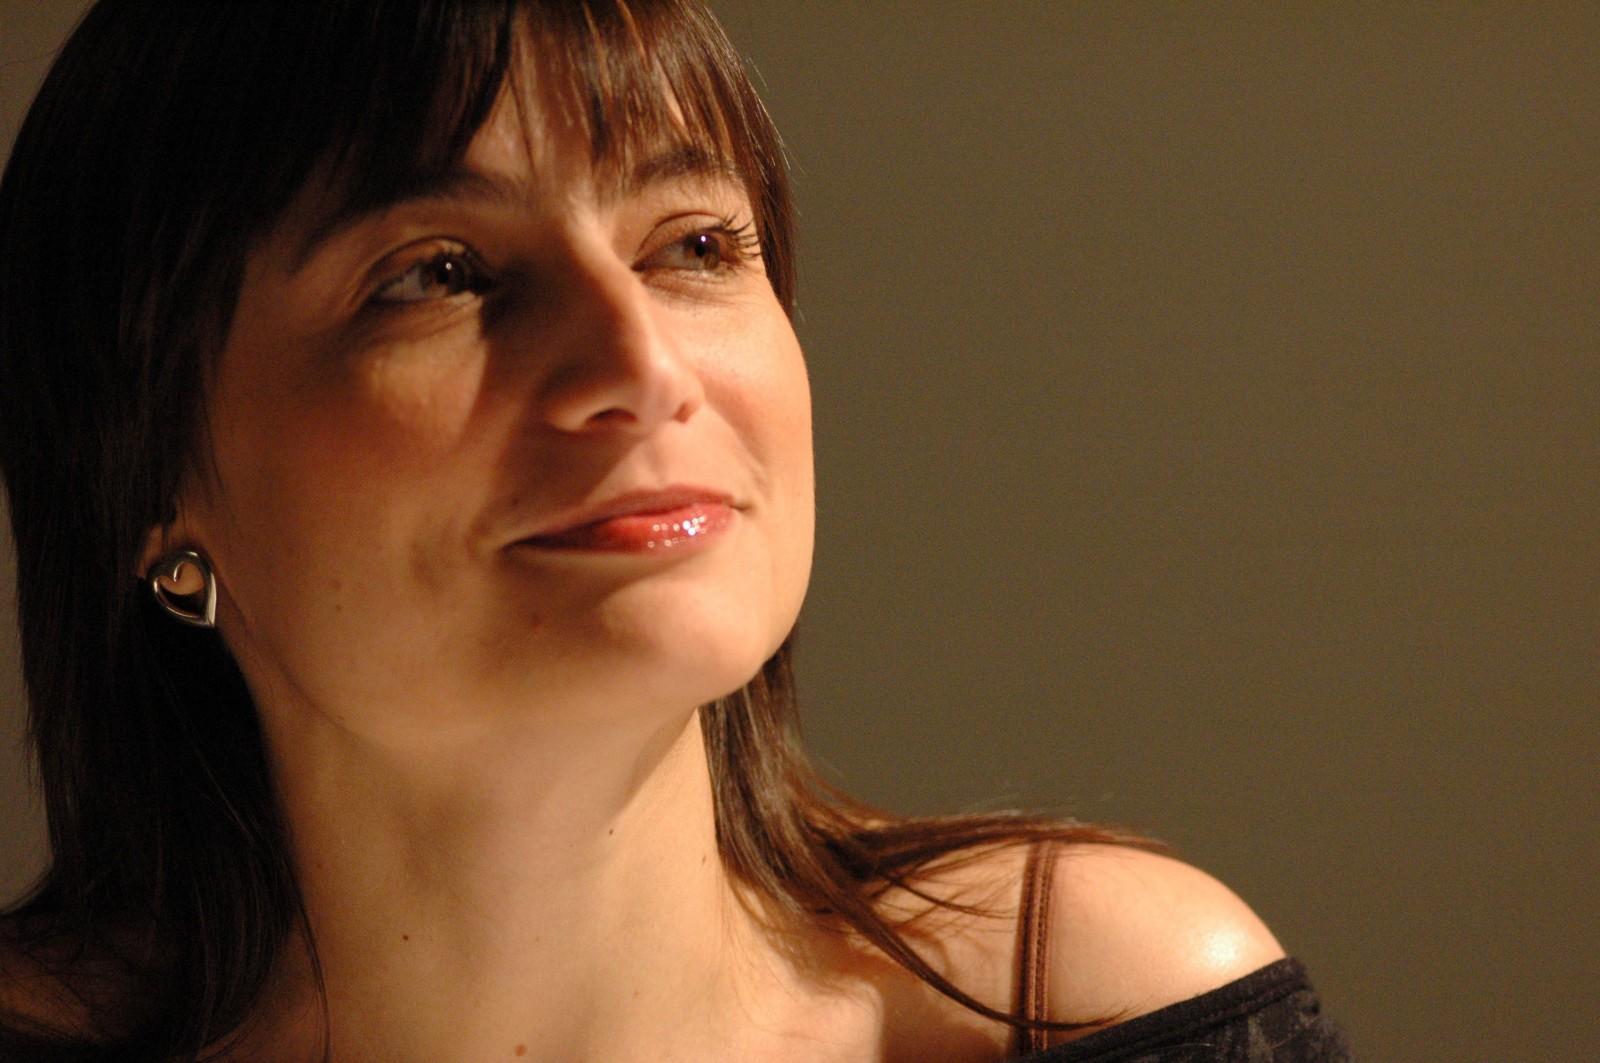 PAS Nantes 2010 - Aleteia Selonk (Brésil) - Productrice - WOMAN OF THE FATHER